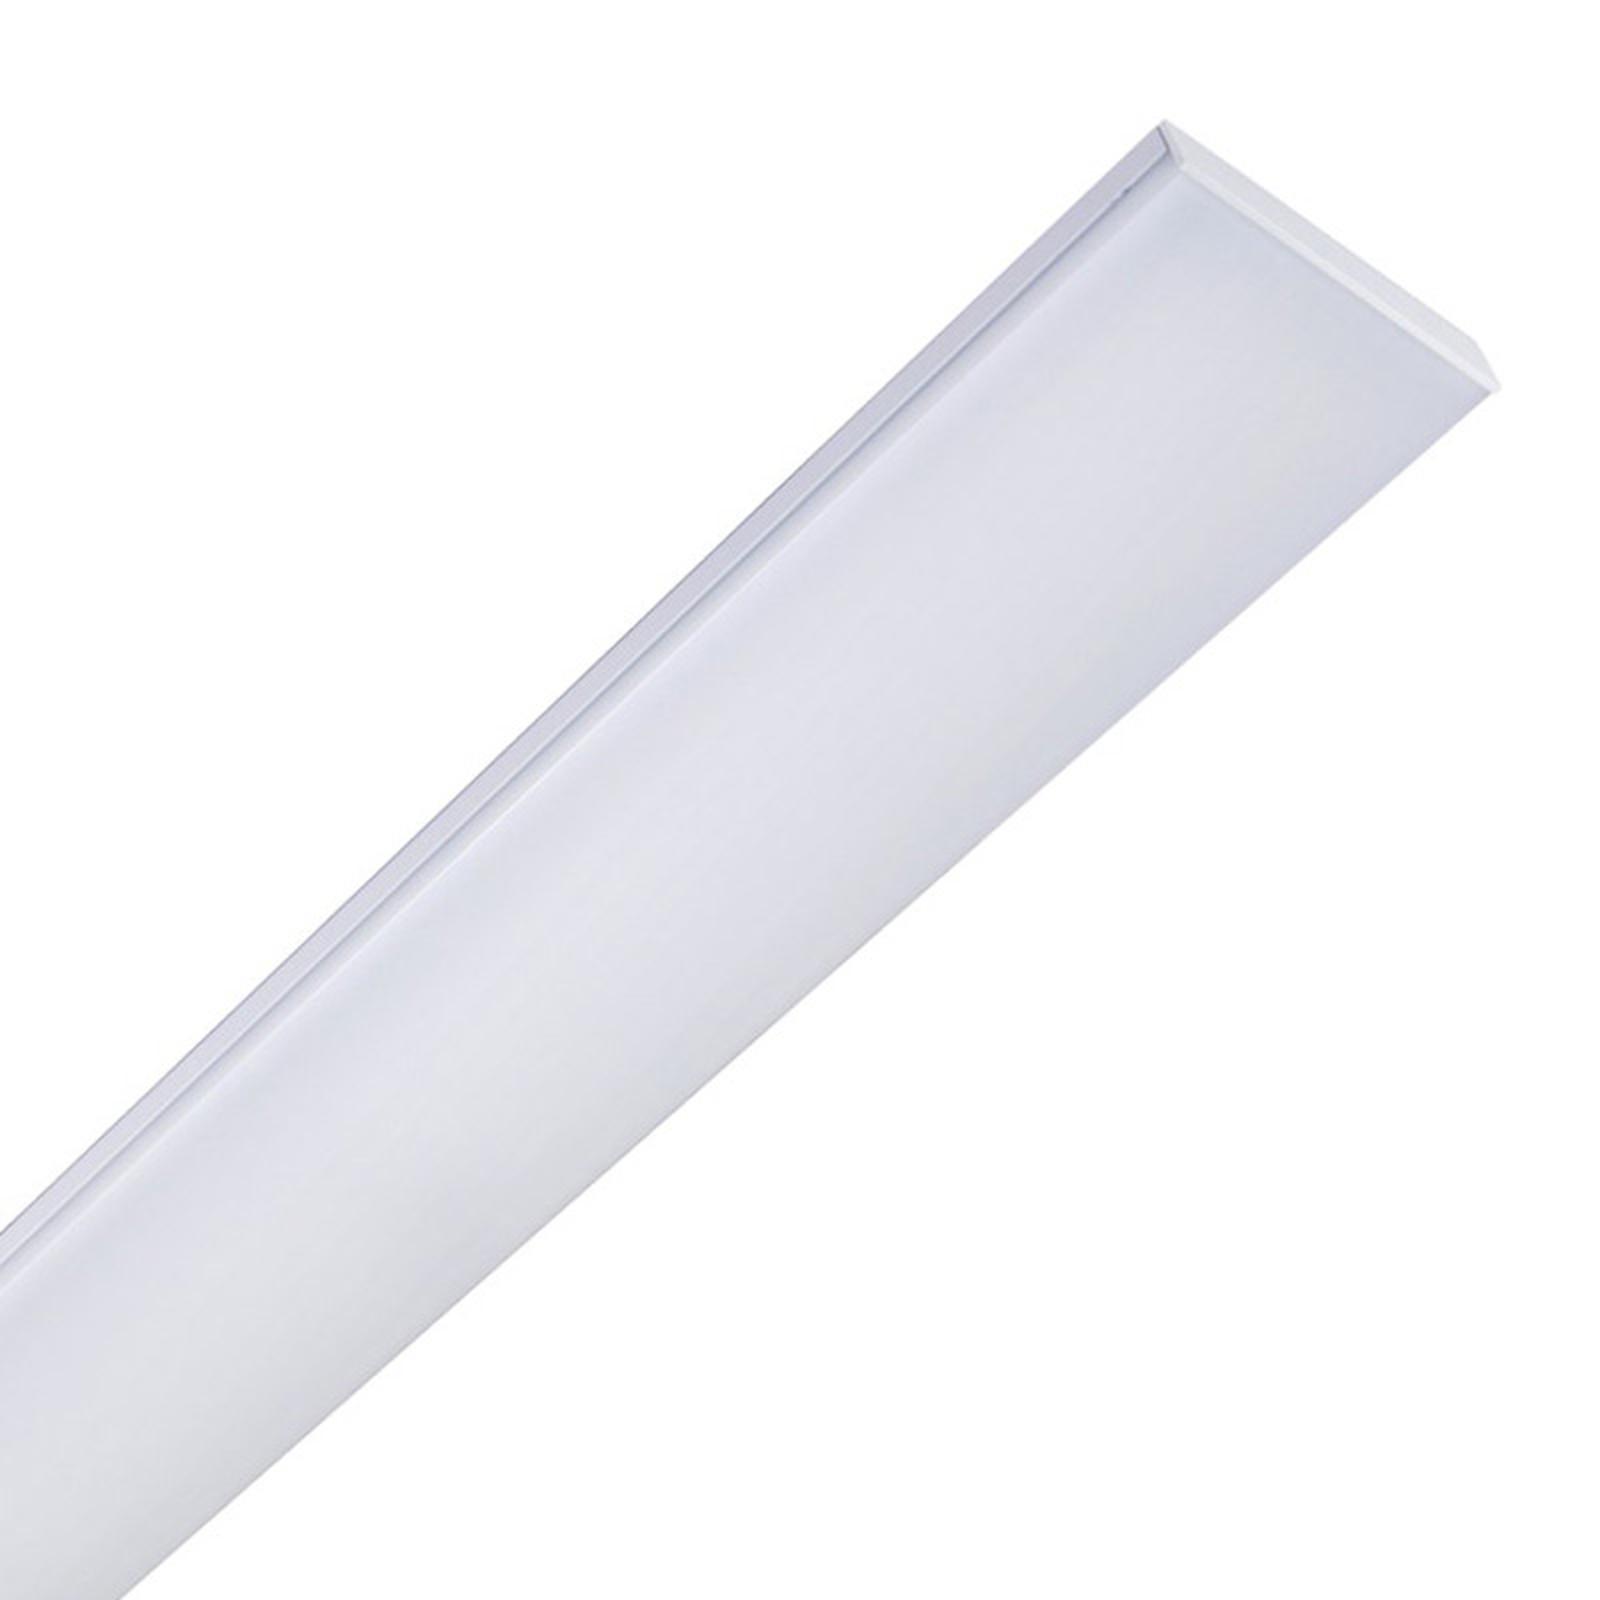 LED-kattovalaisin Planus 60, perusvalkoiset LEDit